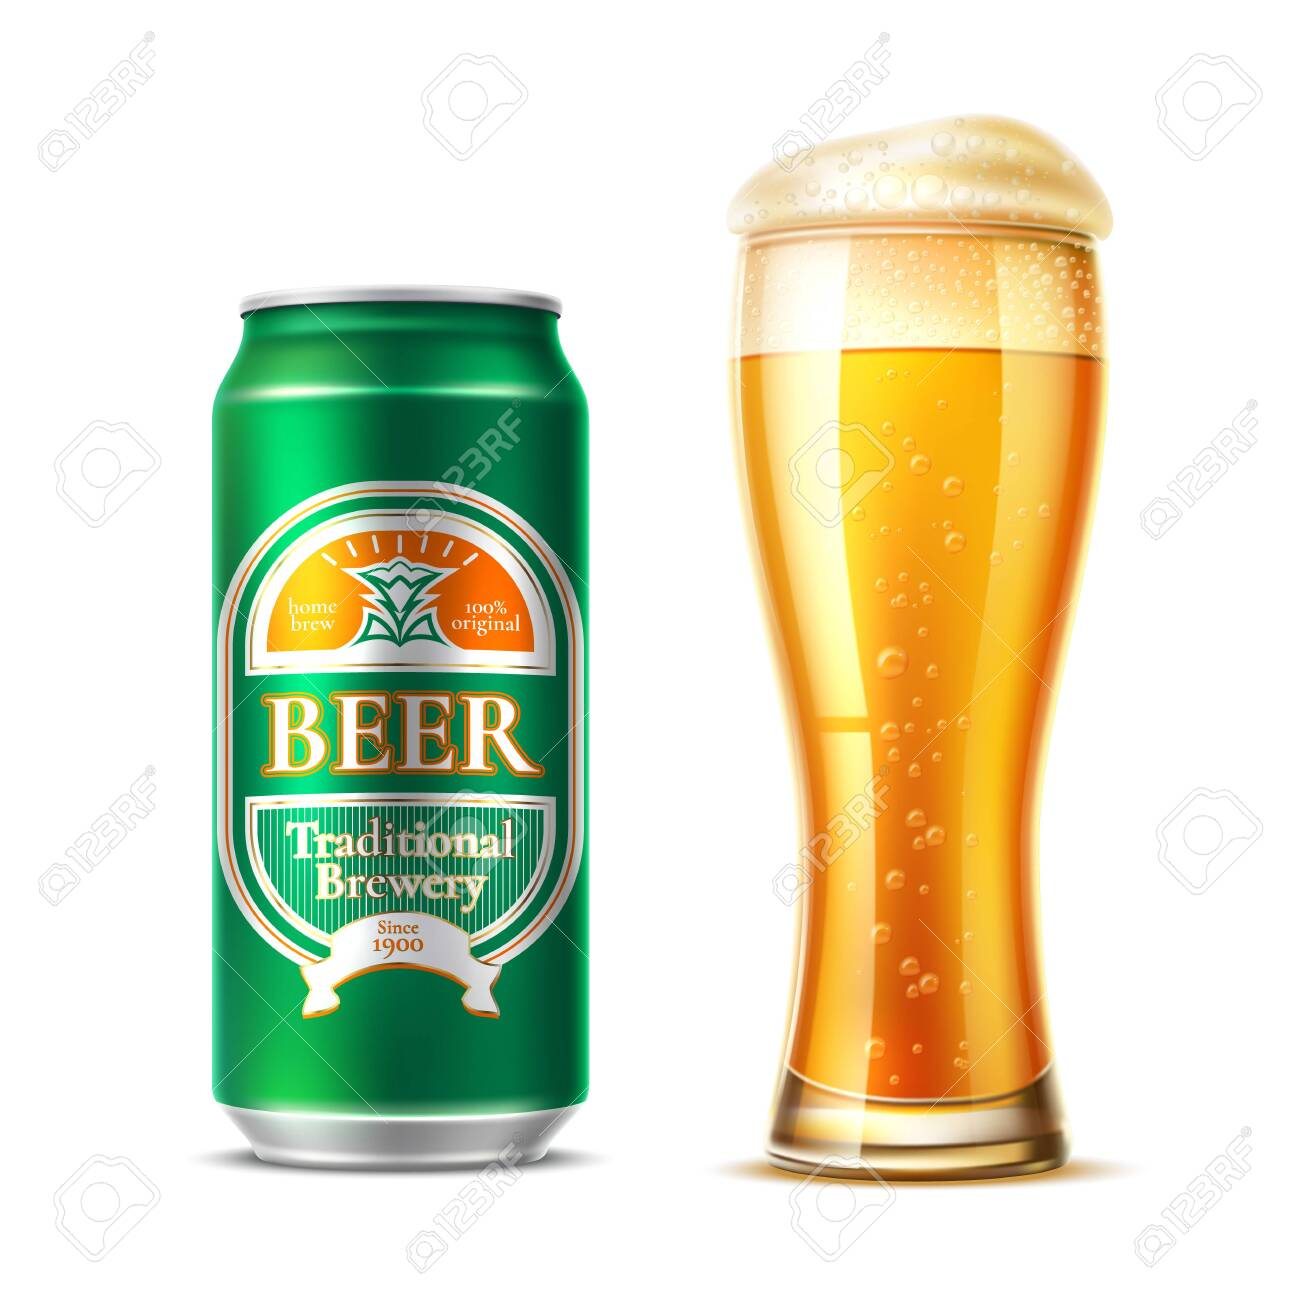 Vector realistic beer glass lager beer bottle - 131822417